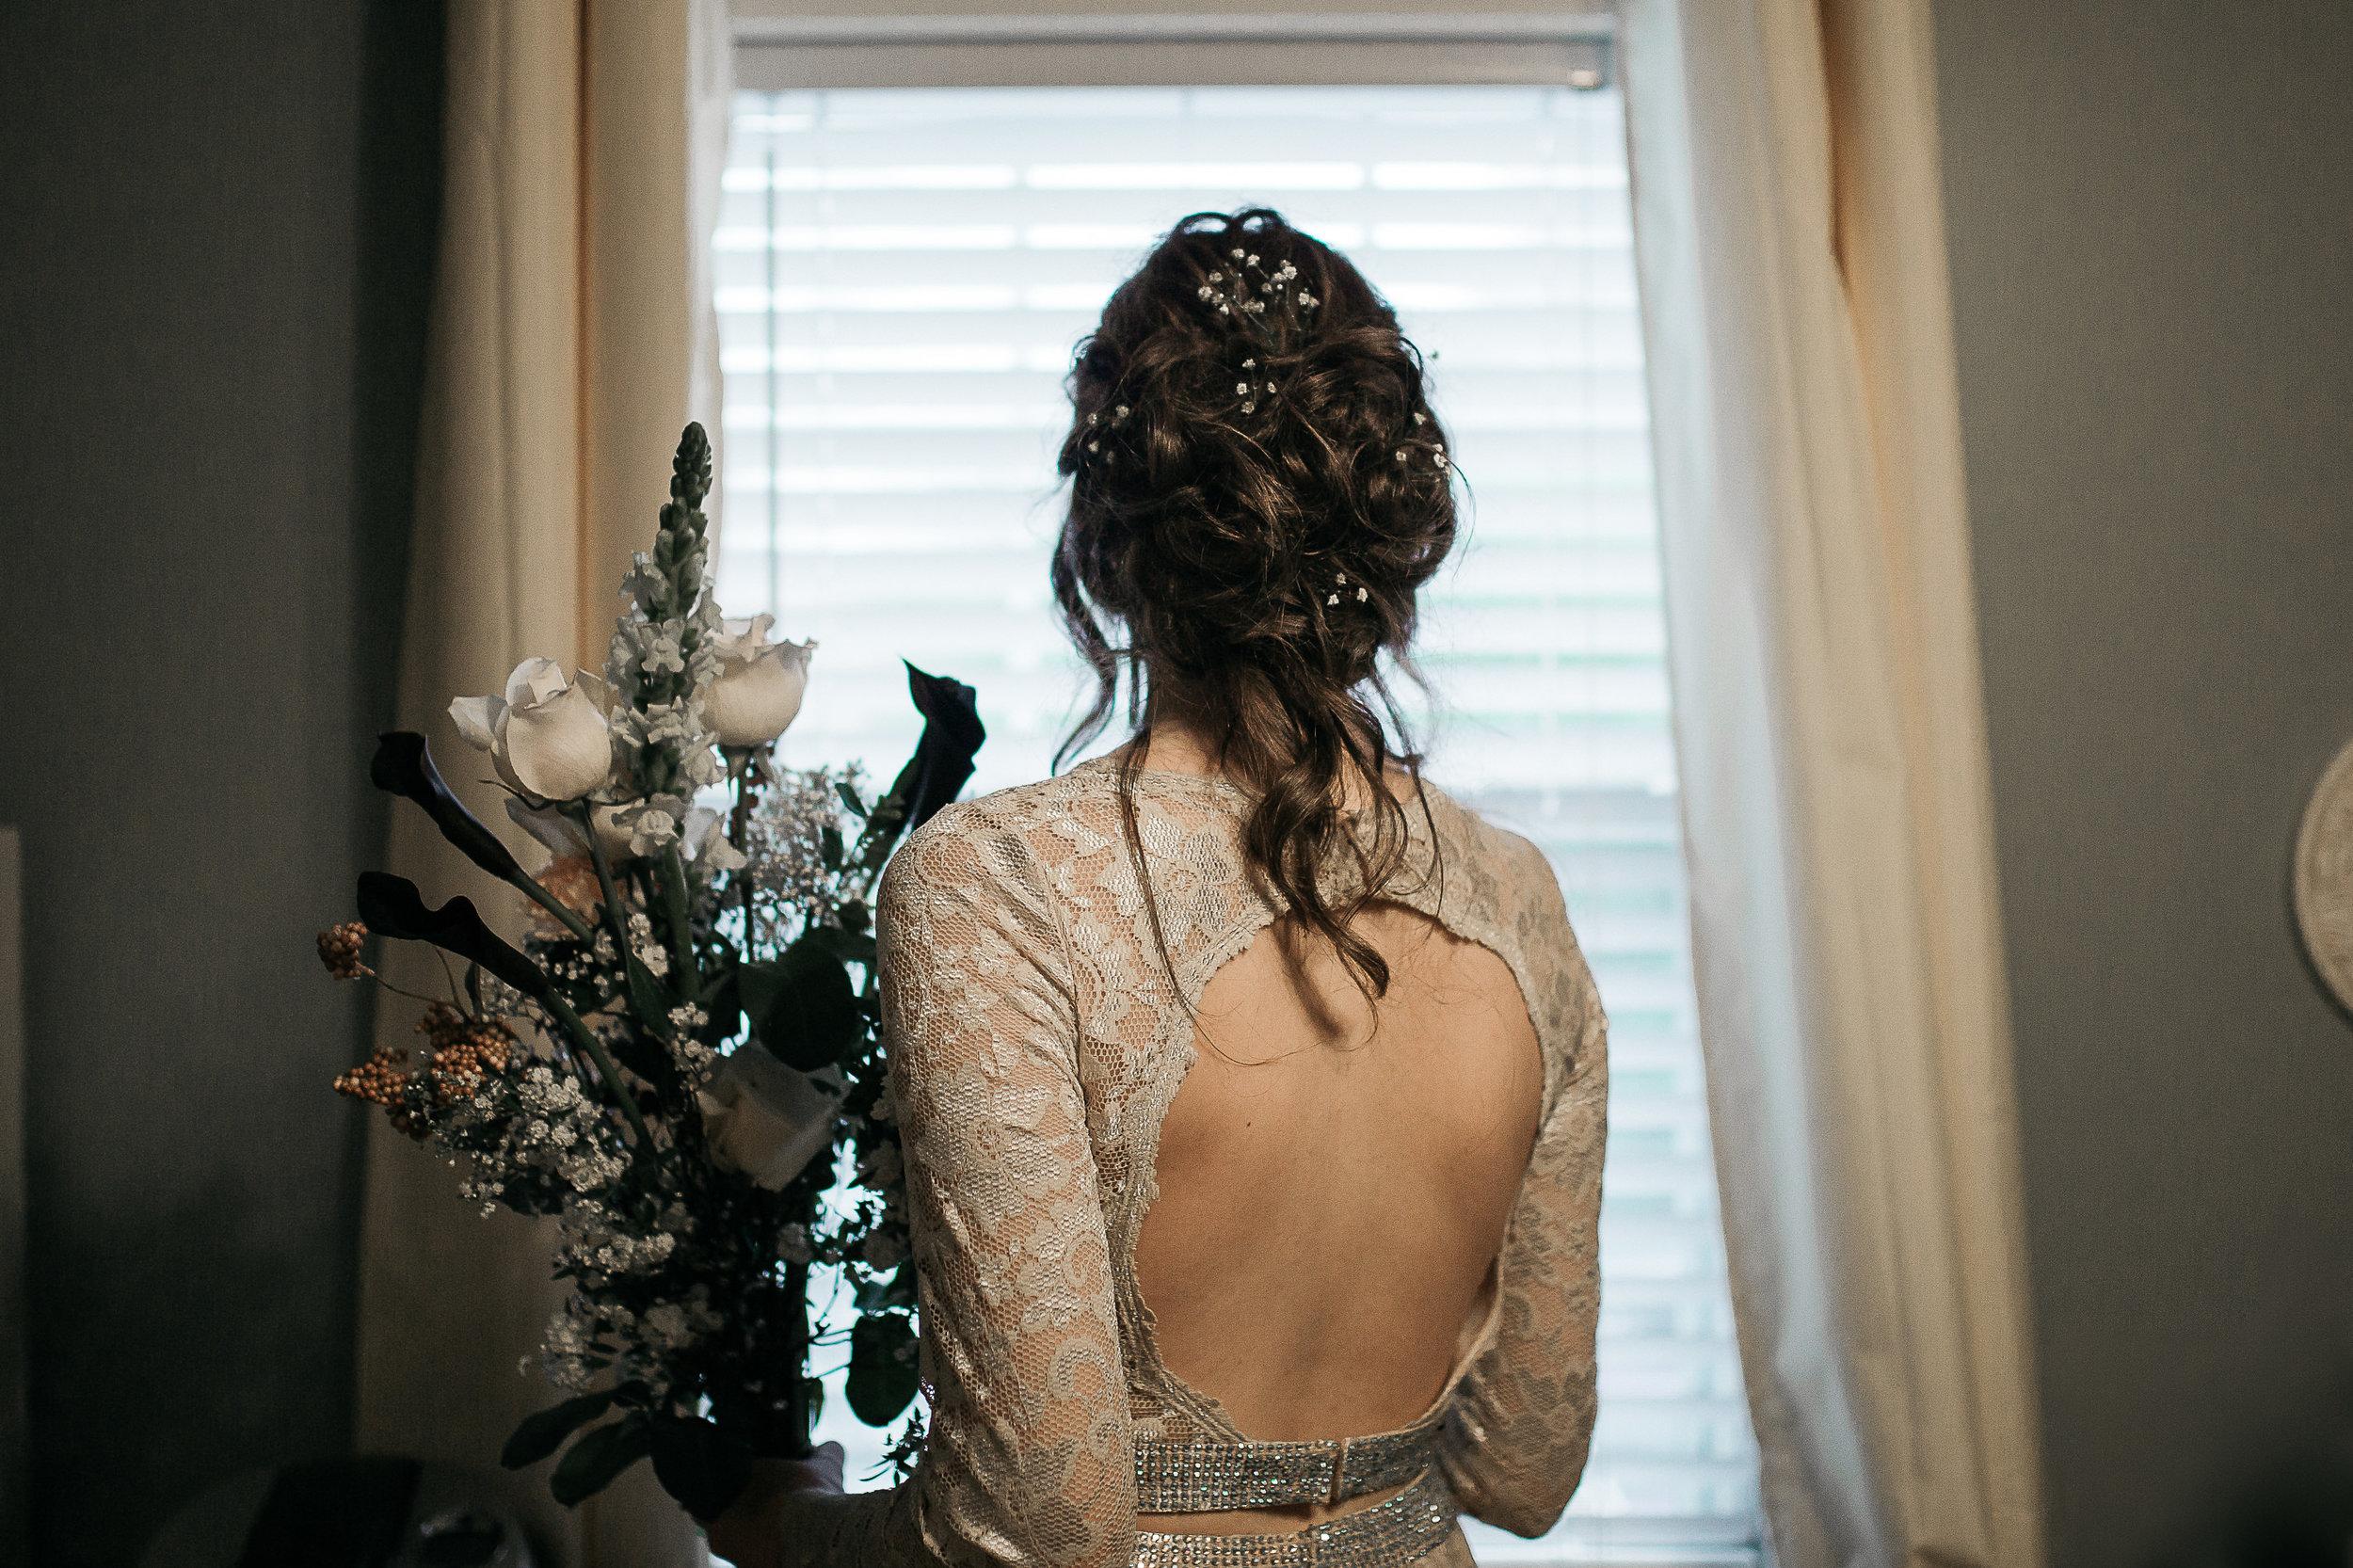 memphis-wedding-photographer-cassie-cook-photography-loya-first-look